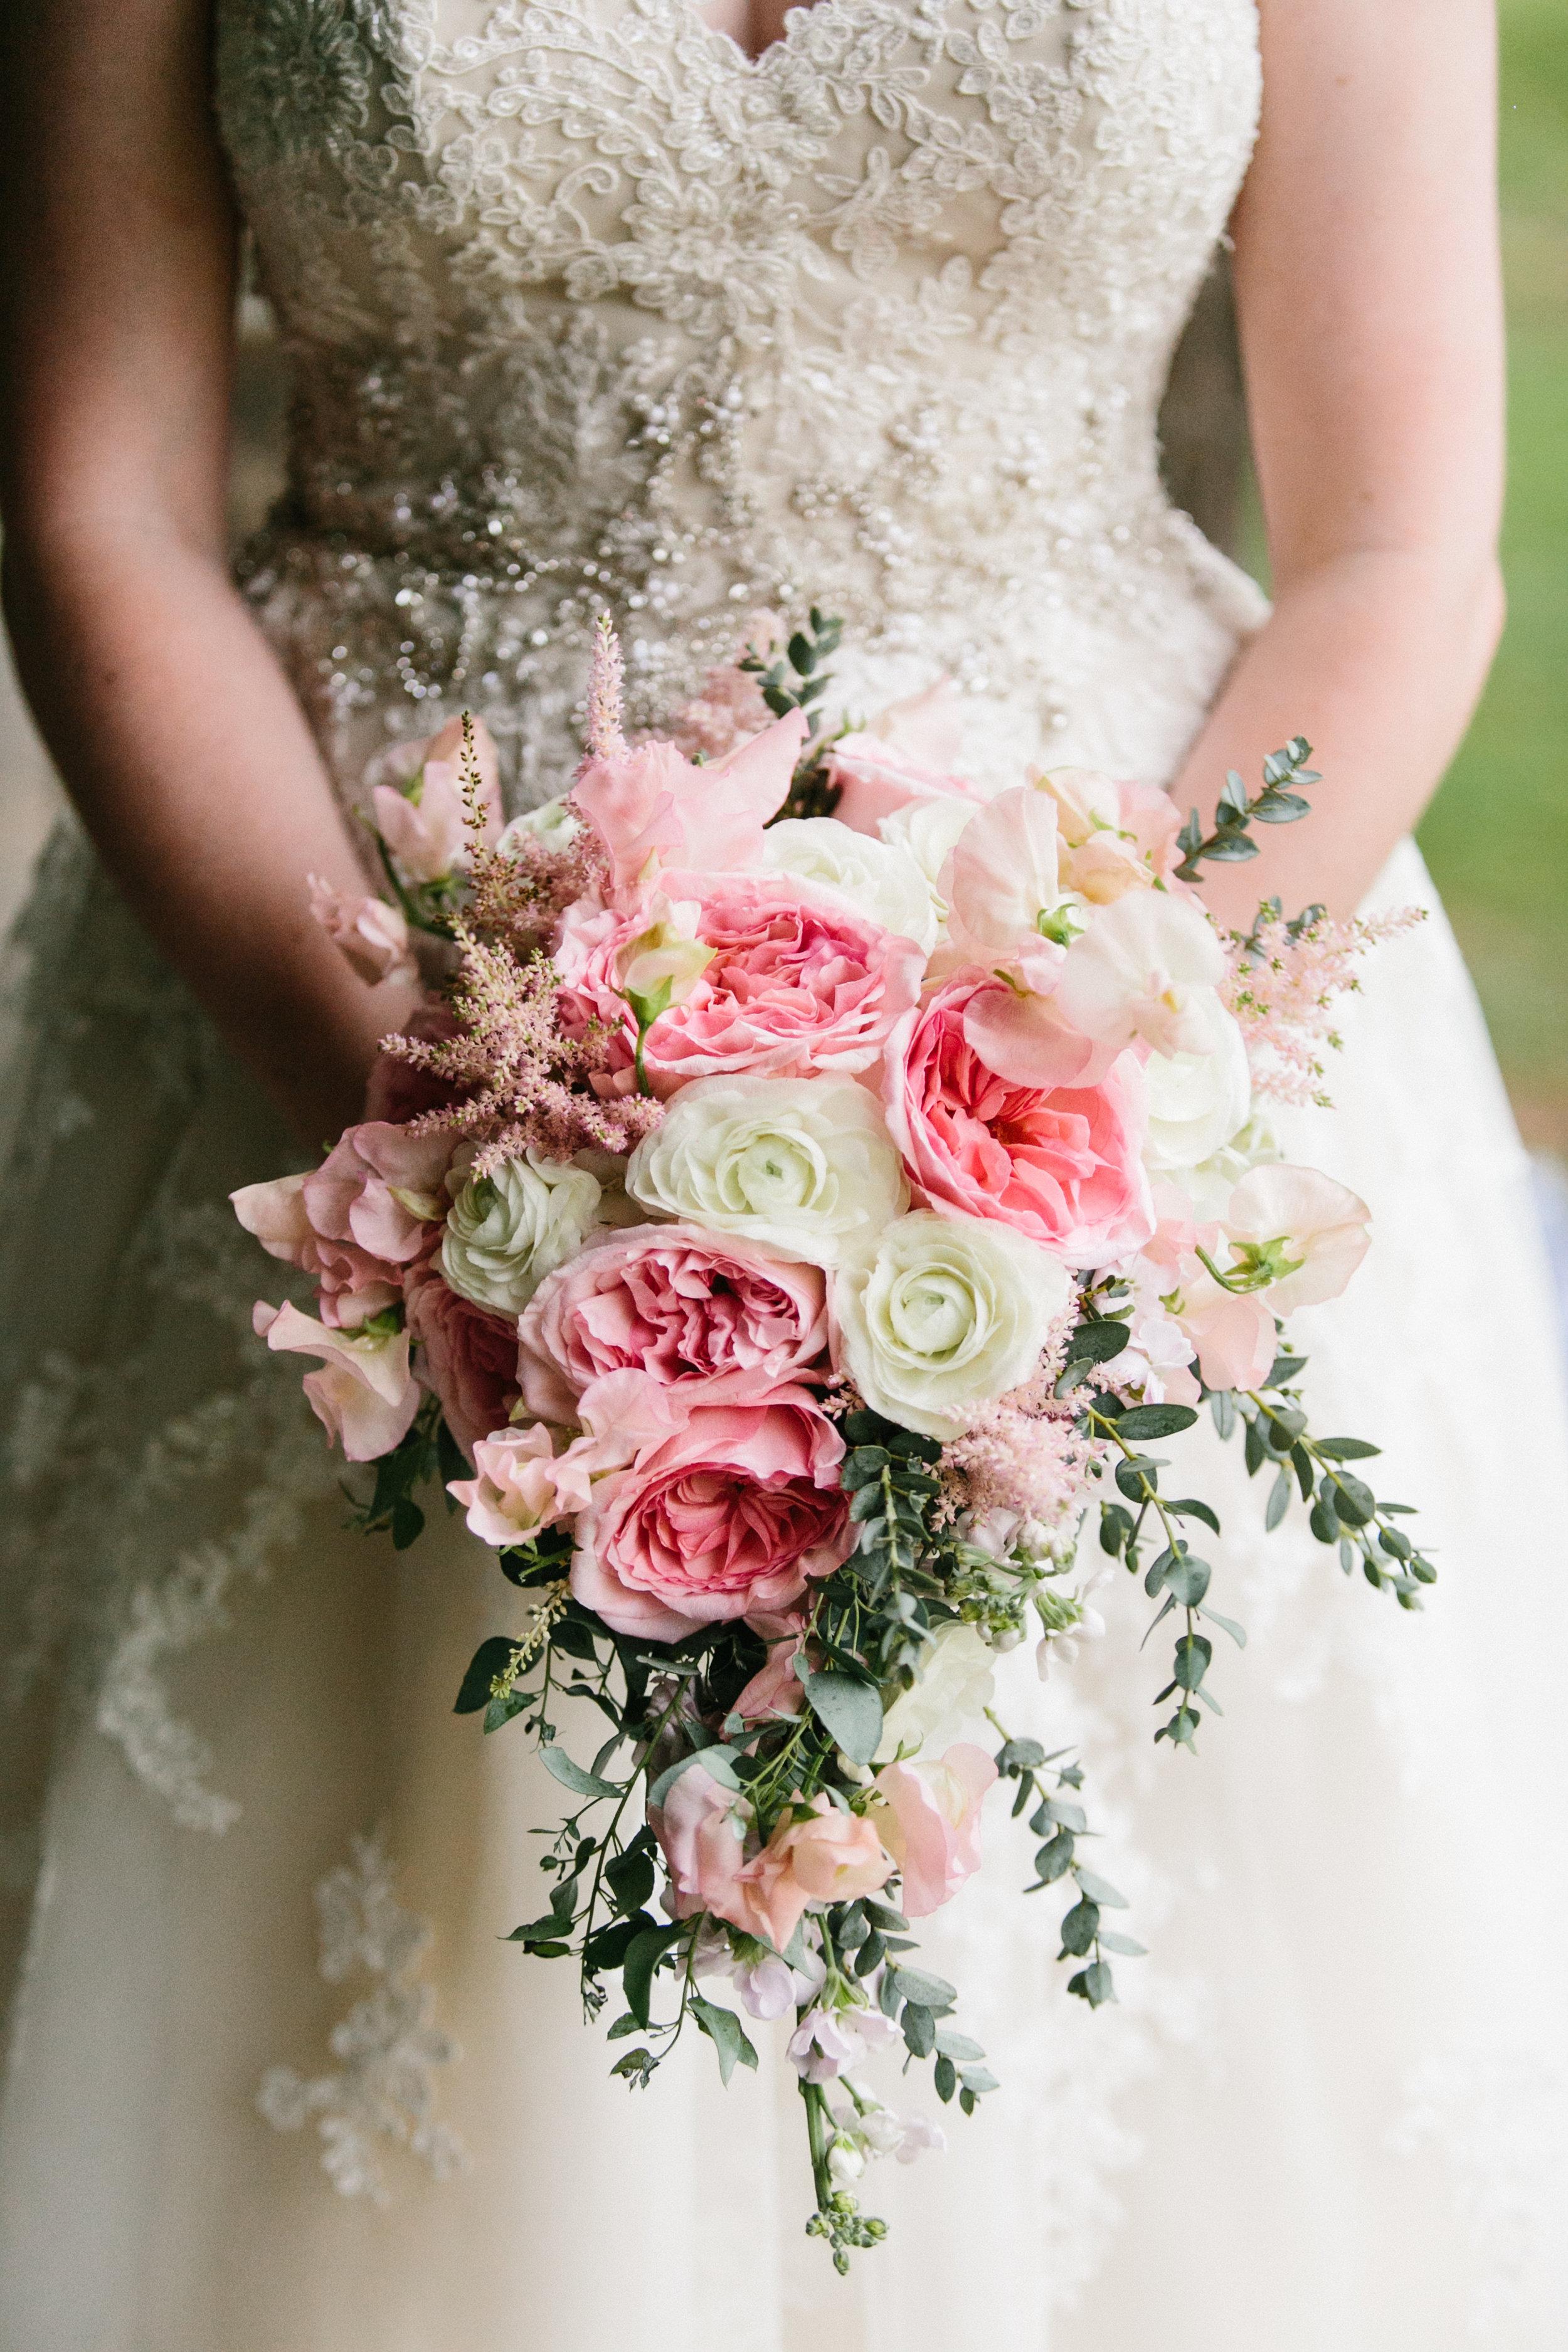 Lydia_johnathan_Wedding_Abigail_Malone_Photography-286.jpg